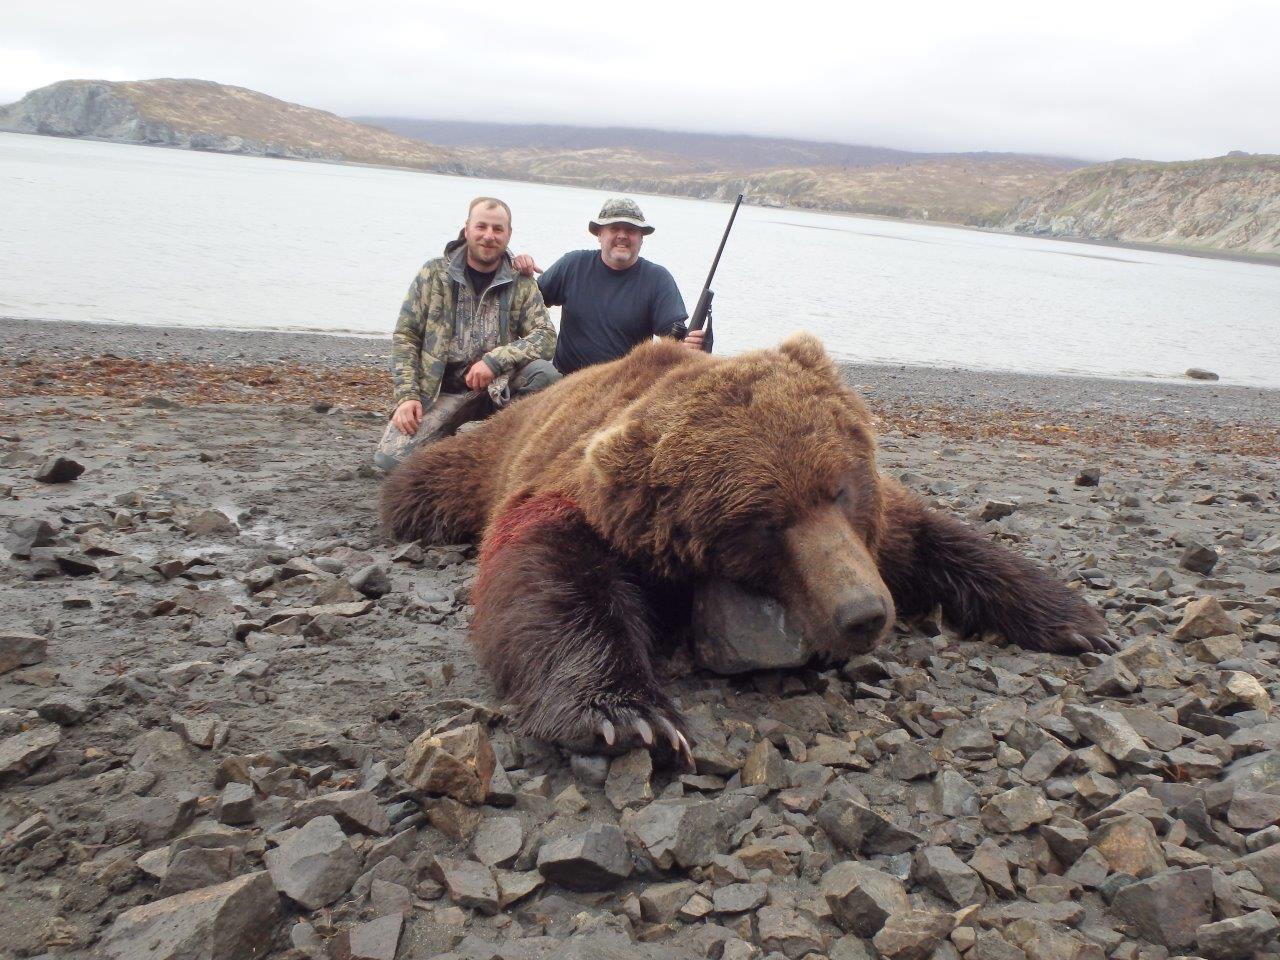 alaska_brown_bear_ruhuntalaska.jpg